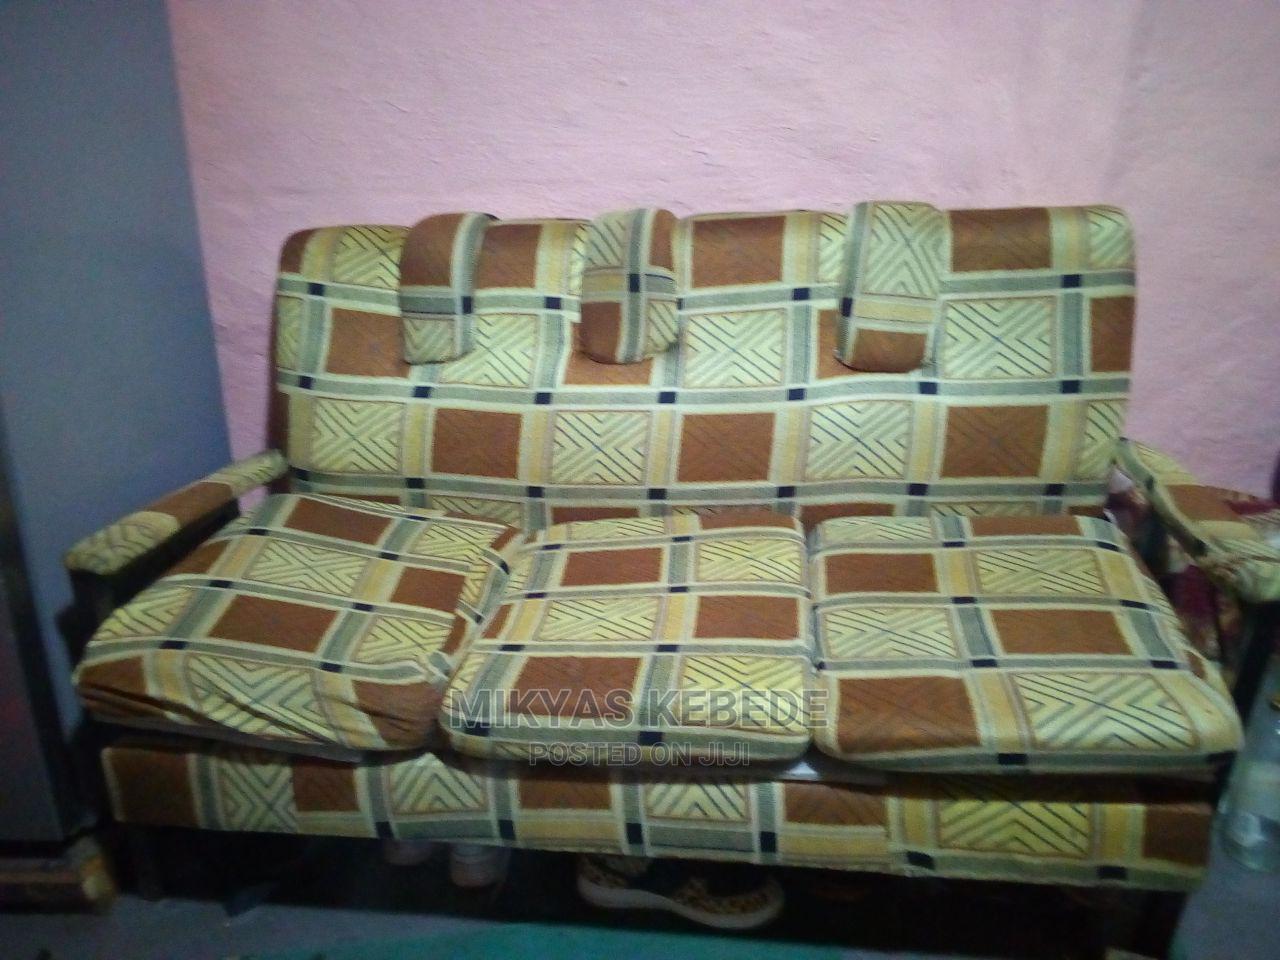 Archive: Ya Berat Sofa Bemtnu Yagelgela Tabe Lala Bet Ymhon